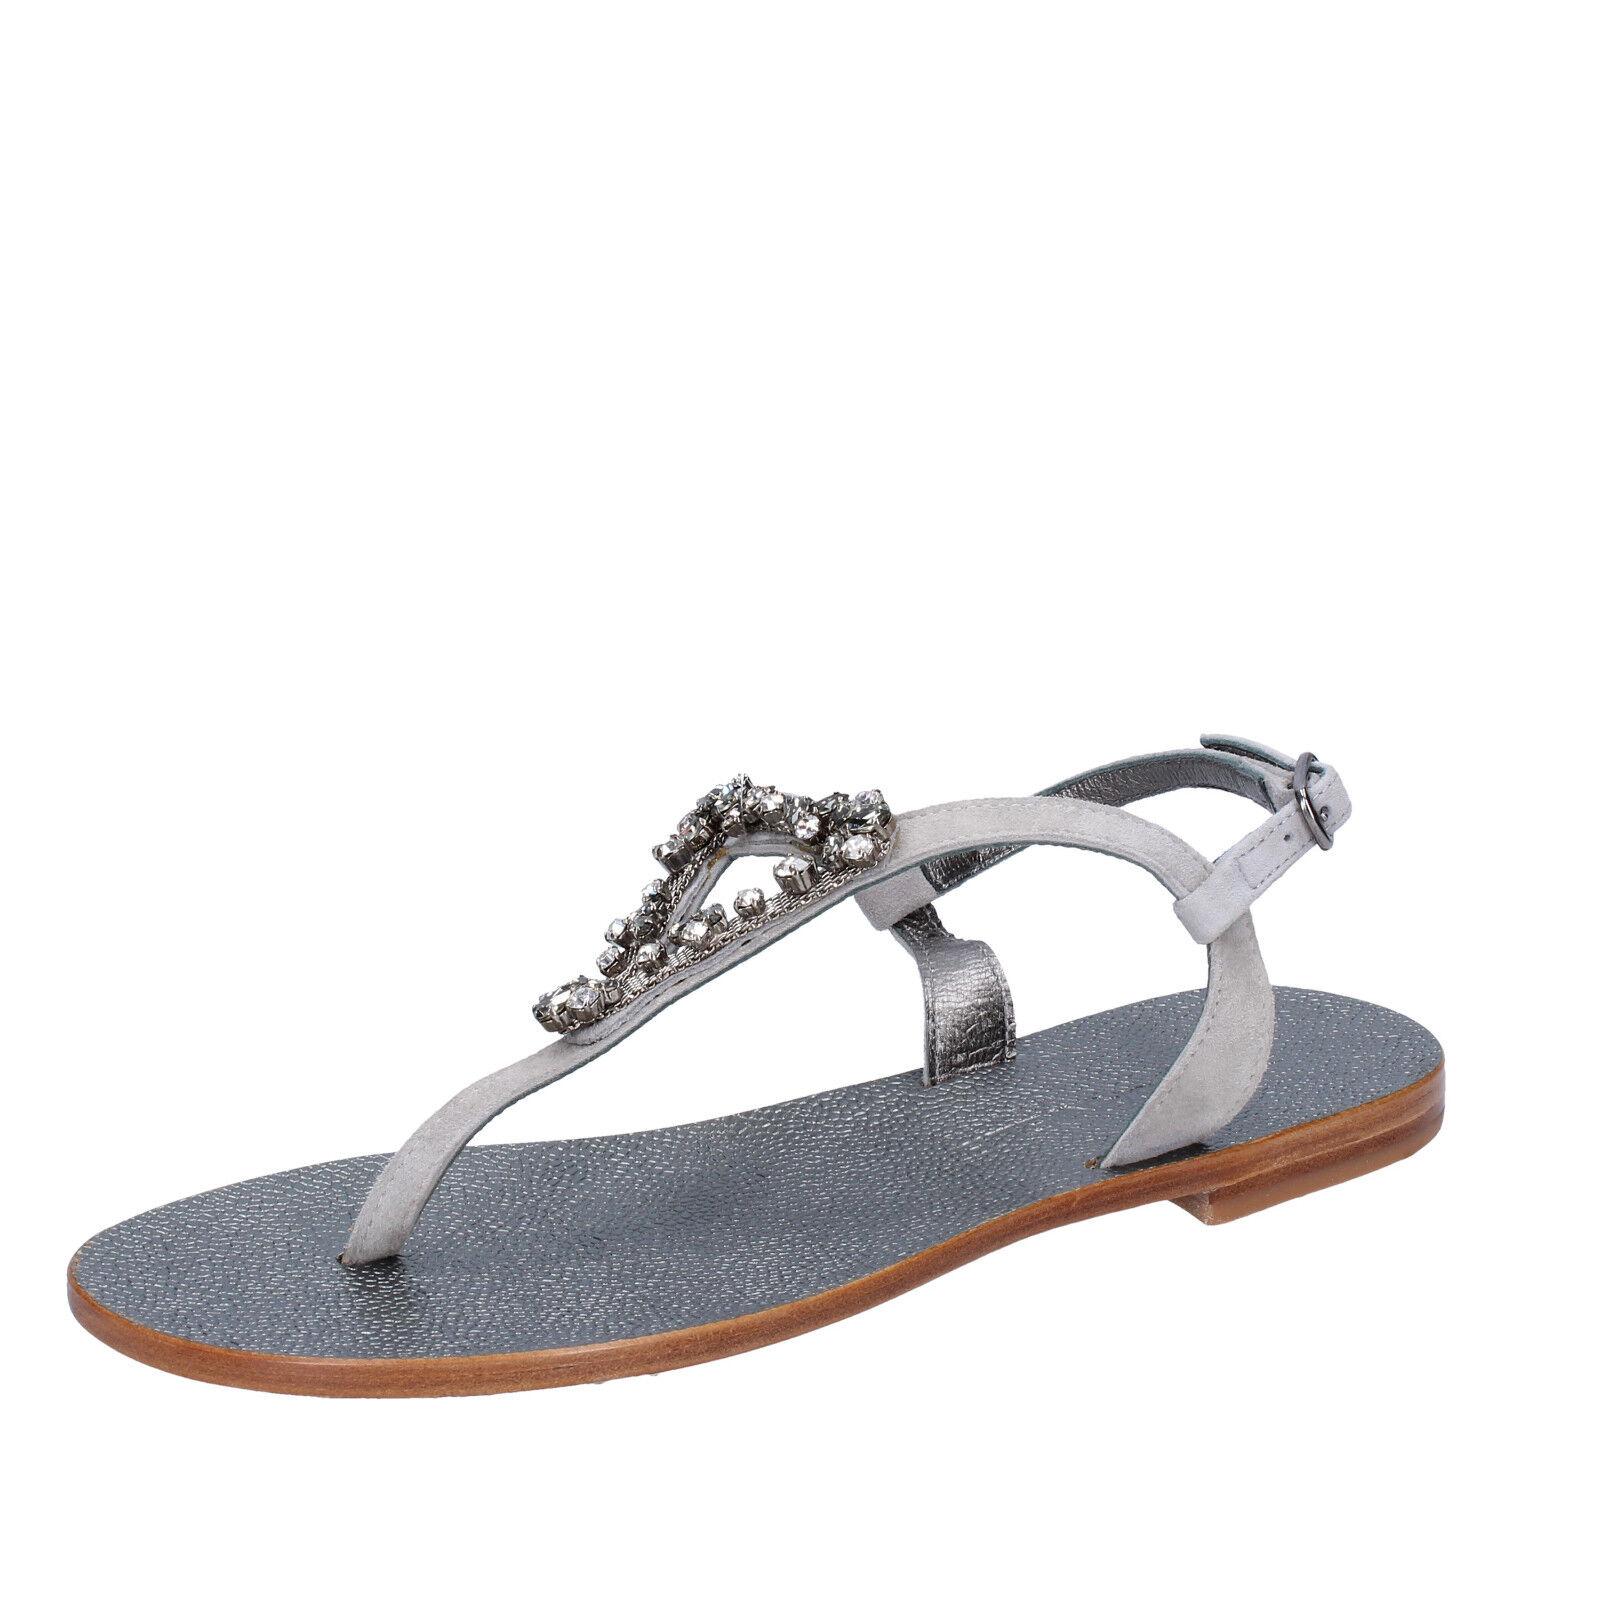 donna EDDY DANIELE 37 EU sandali grigio camoscio swarovski  AW364